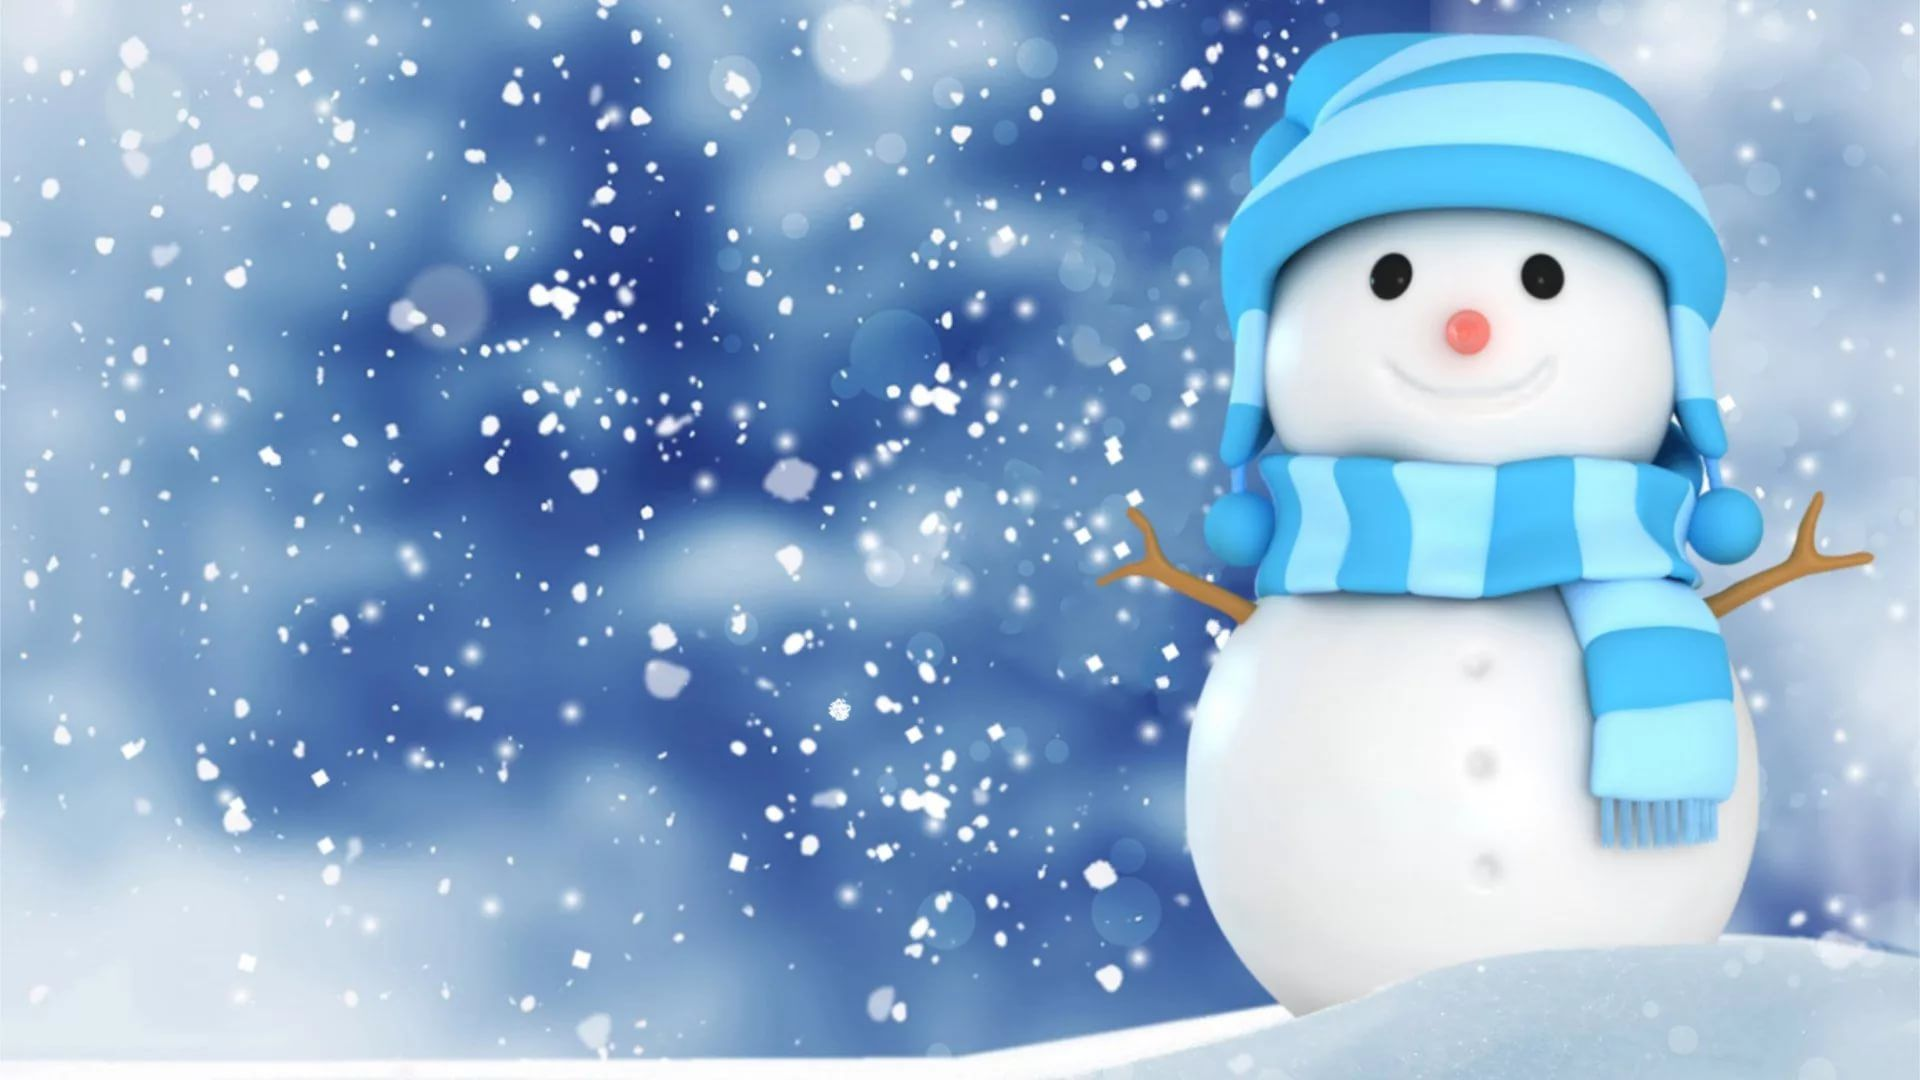 Cute Winter Background Wallpaper HD